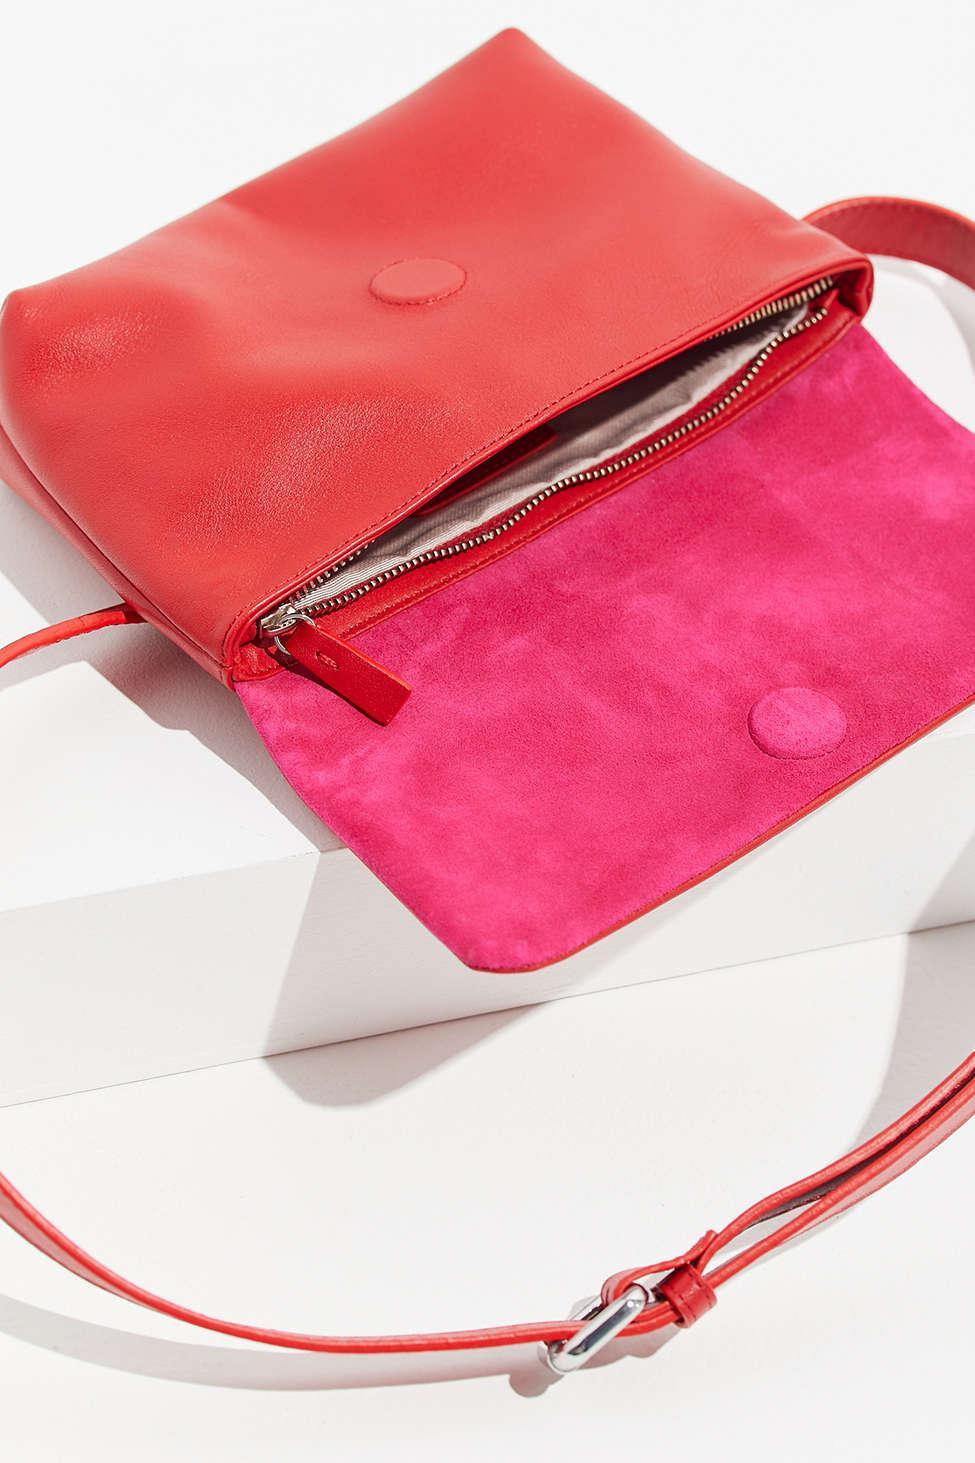 34811a4bcd5dc Vagabond Copenhagen Leather Belt Bag in Red - Lyst